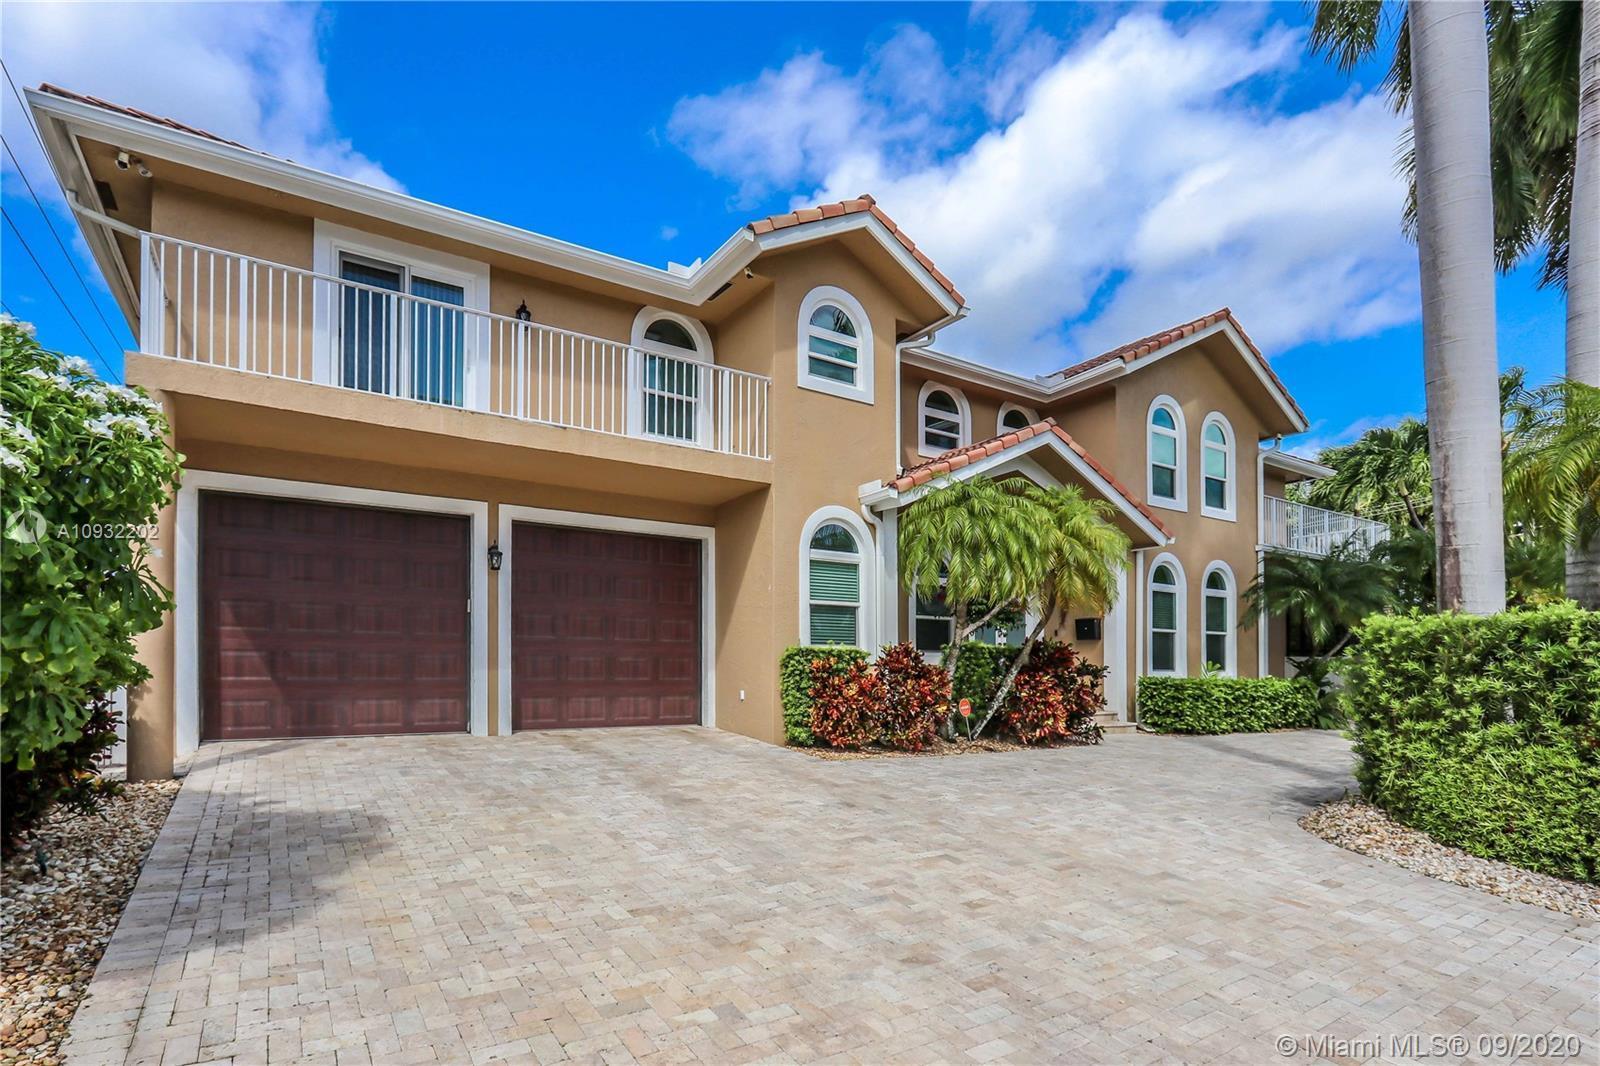 Fabulous 2 story corner home w/ great architecture, circular driveway & 2-car garage. Newer home, bu